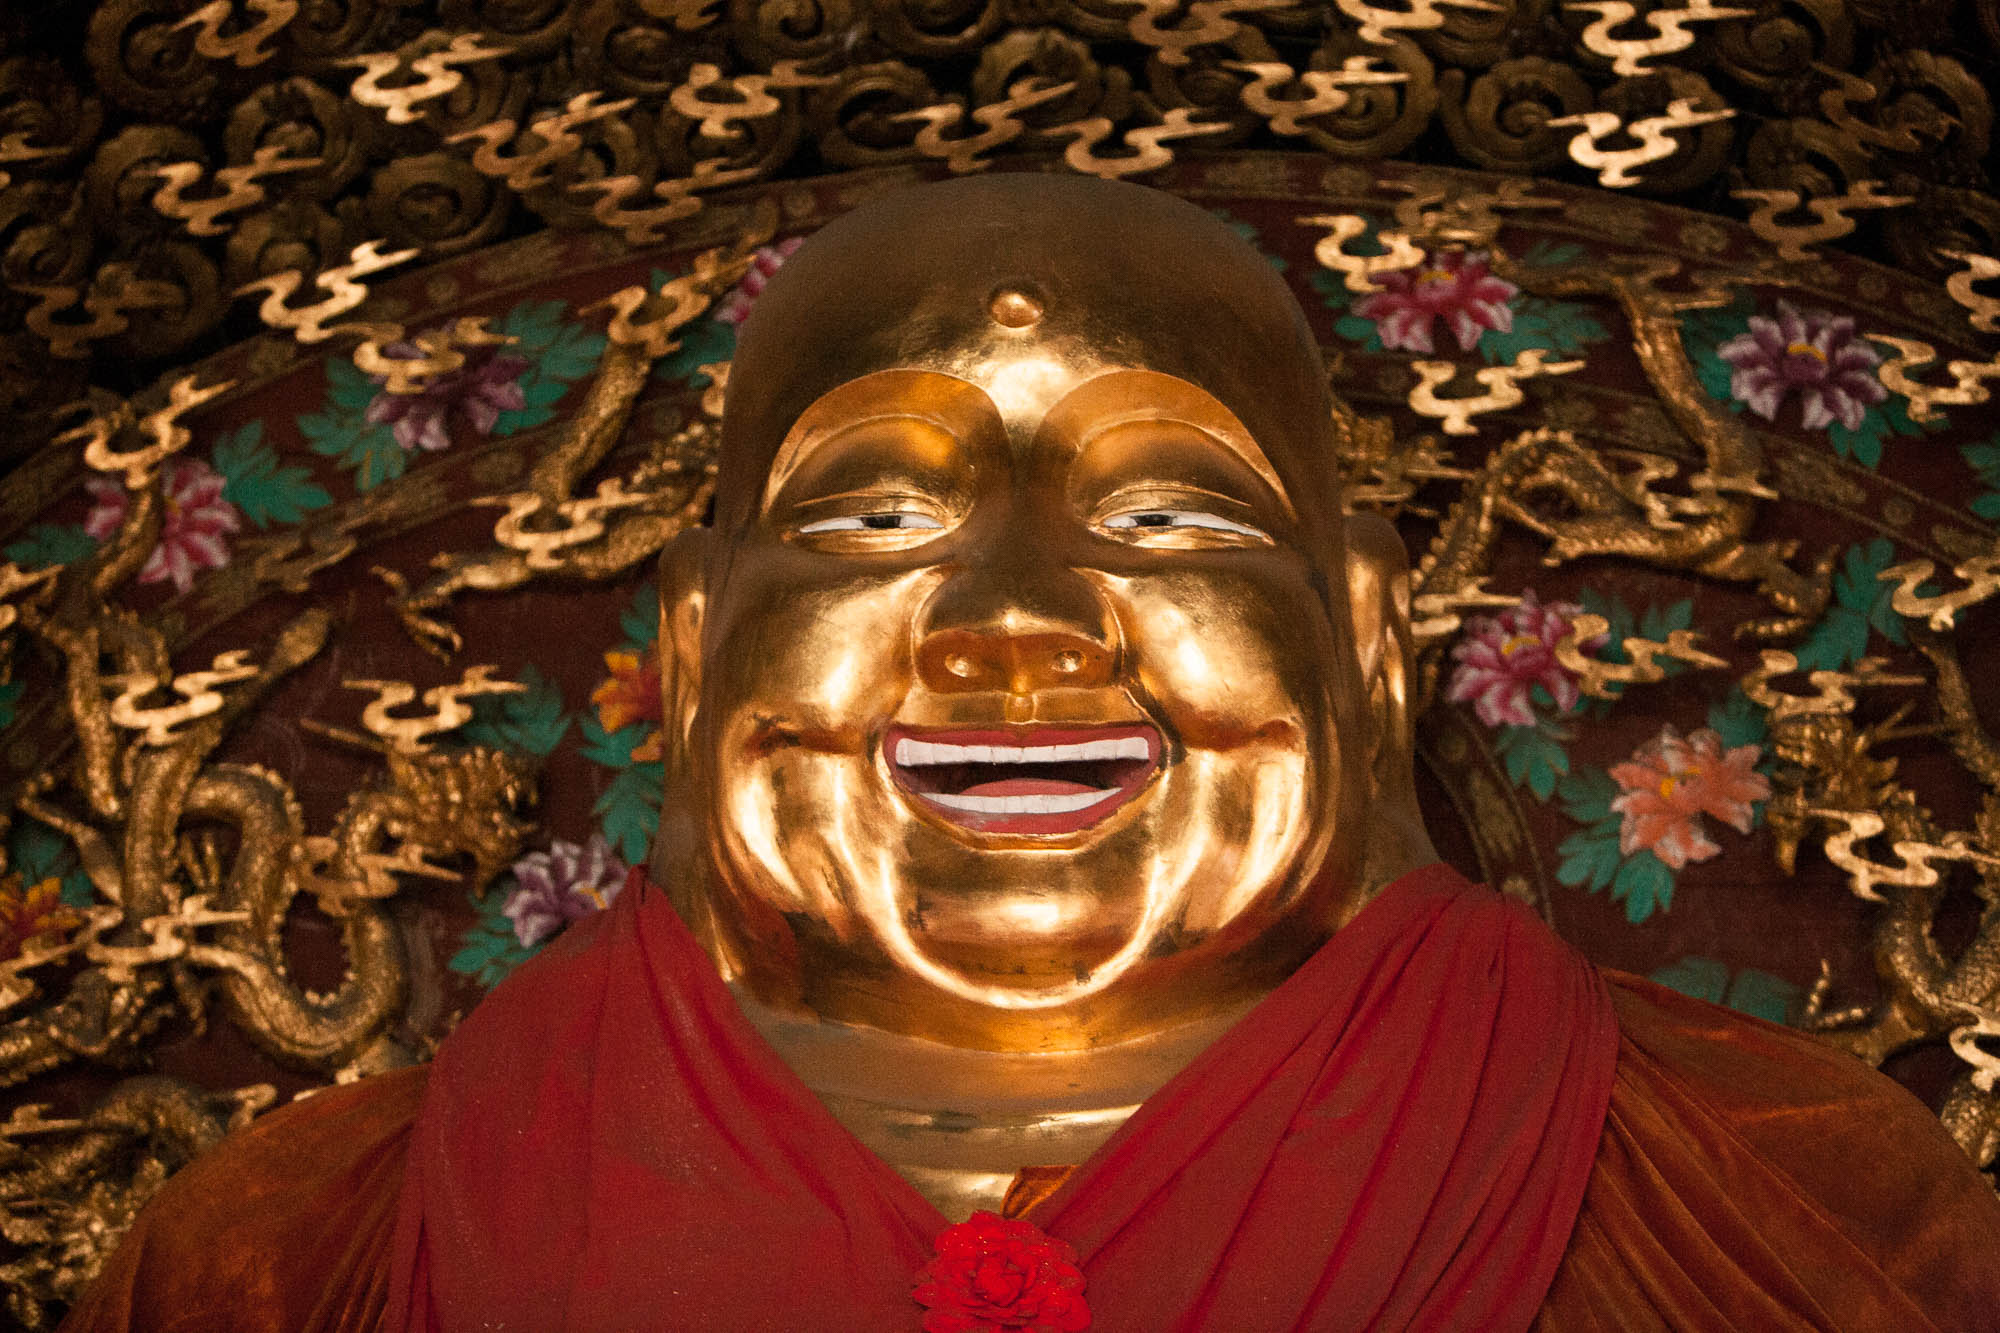 Buddha statue in the White Pagoda of Taigu